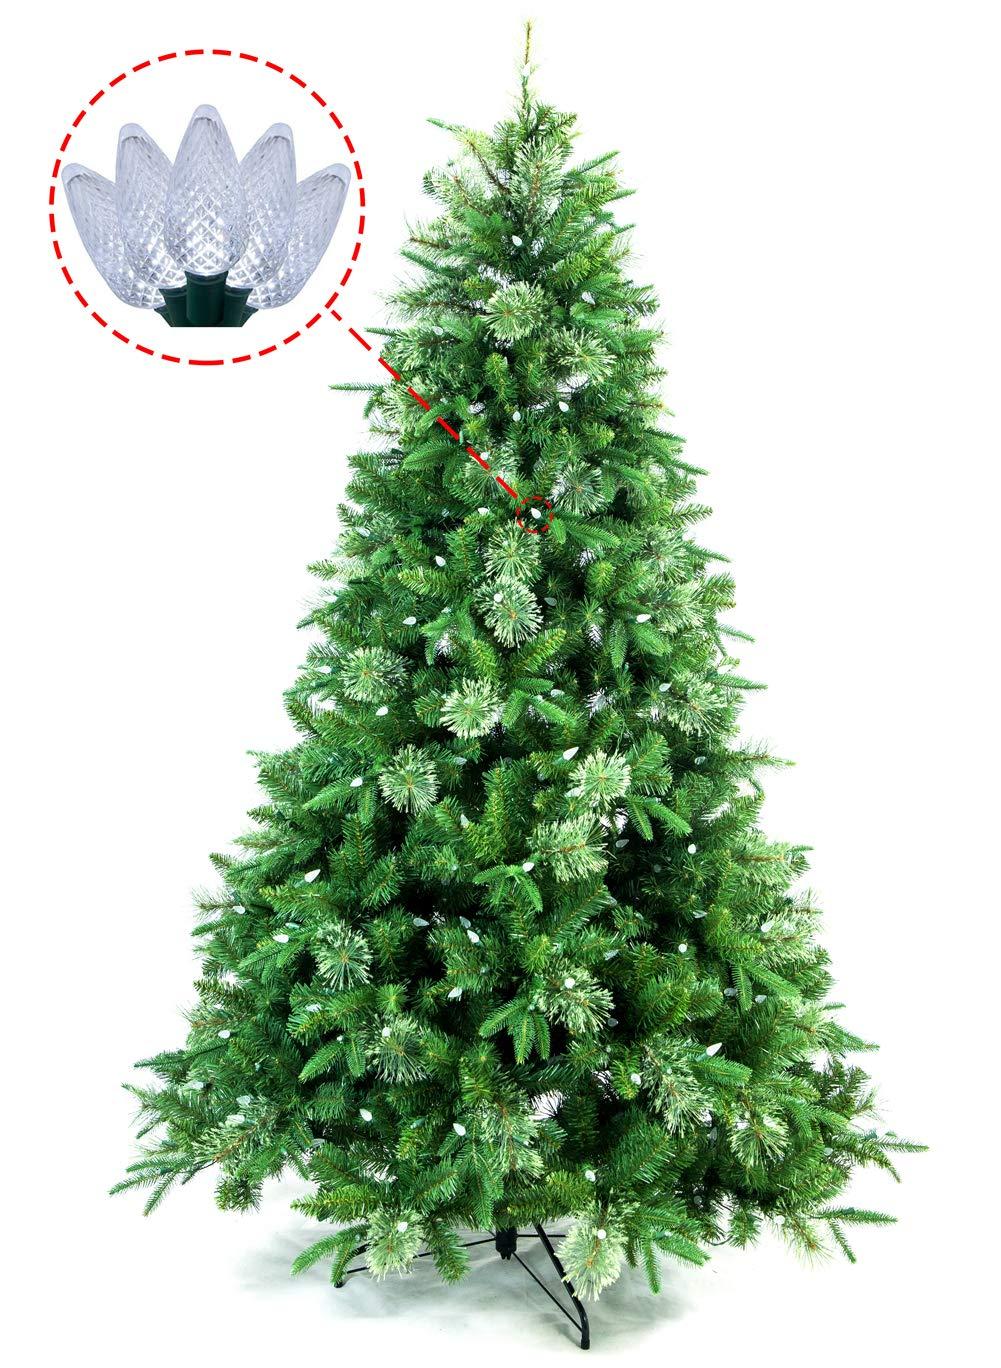 Amazon Com Abusa Artificial Christmas Tree Prelit 9 Ft Xmas Pine Tree With 1000 Led Lights 2063nch Tips Home Kitchen